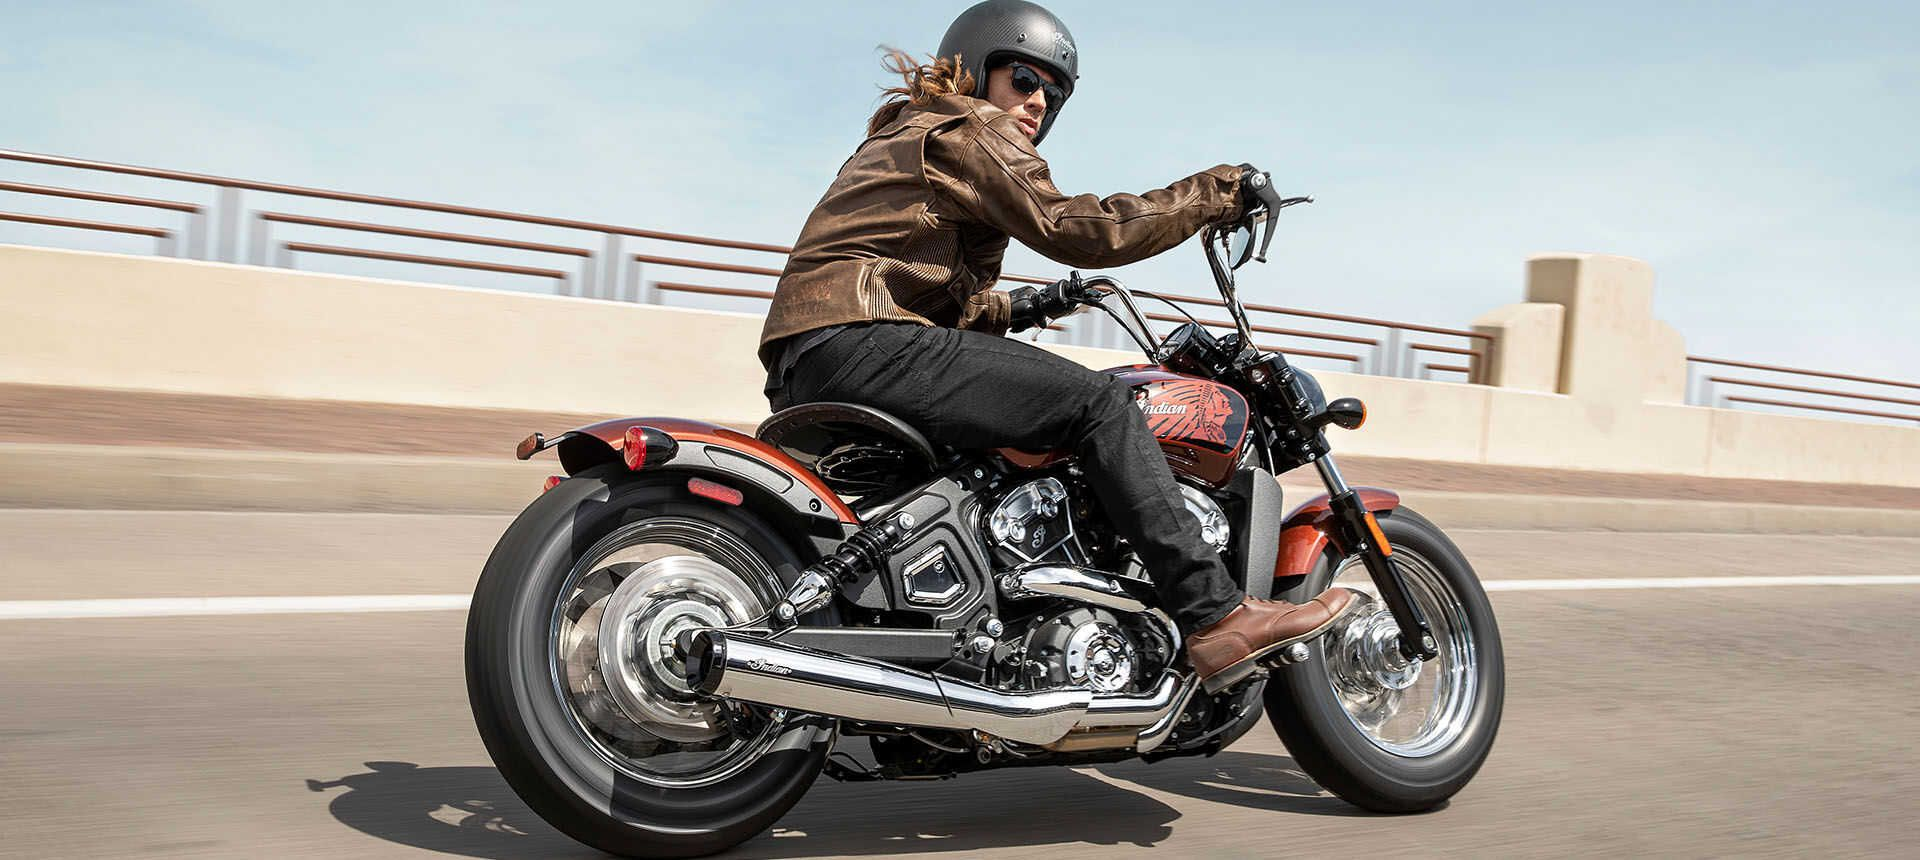 Мотоцикл Indian Scout Bobber Twenty Sagebrush Smoke 2020 - 6